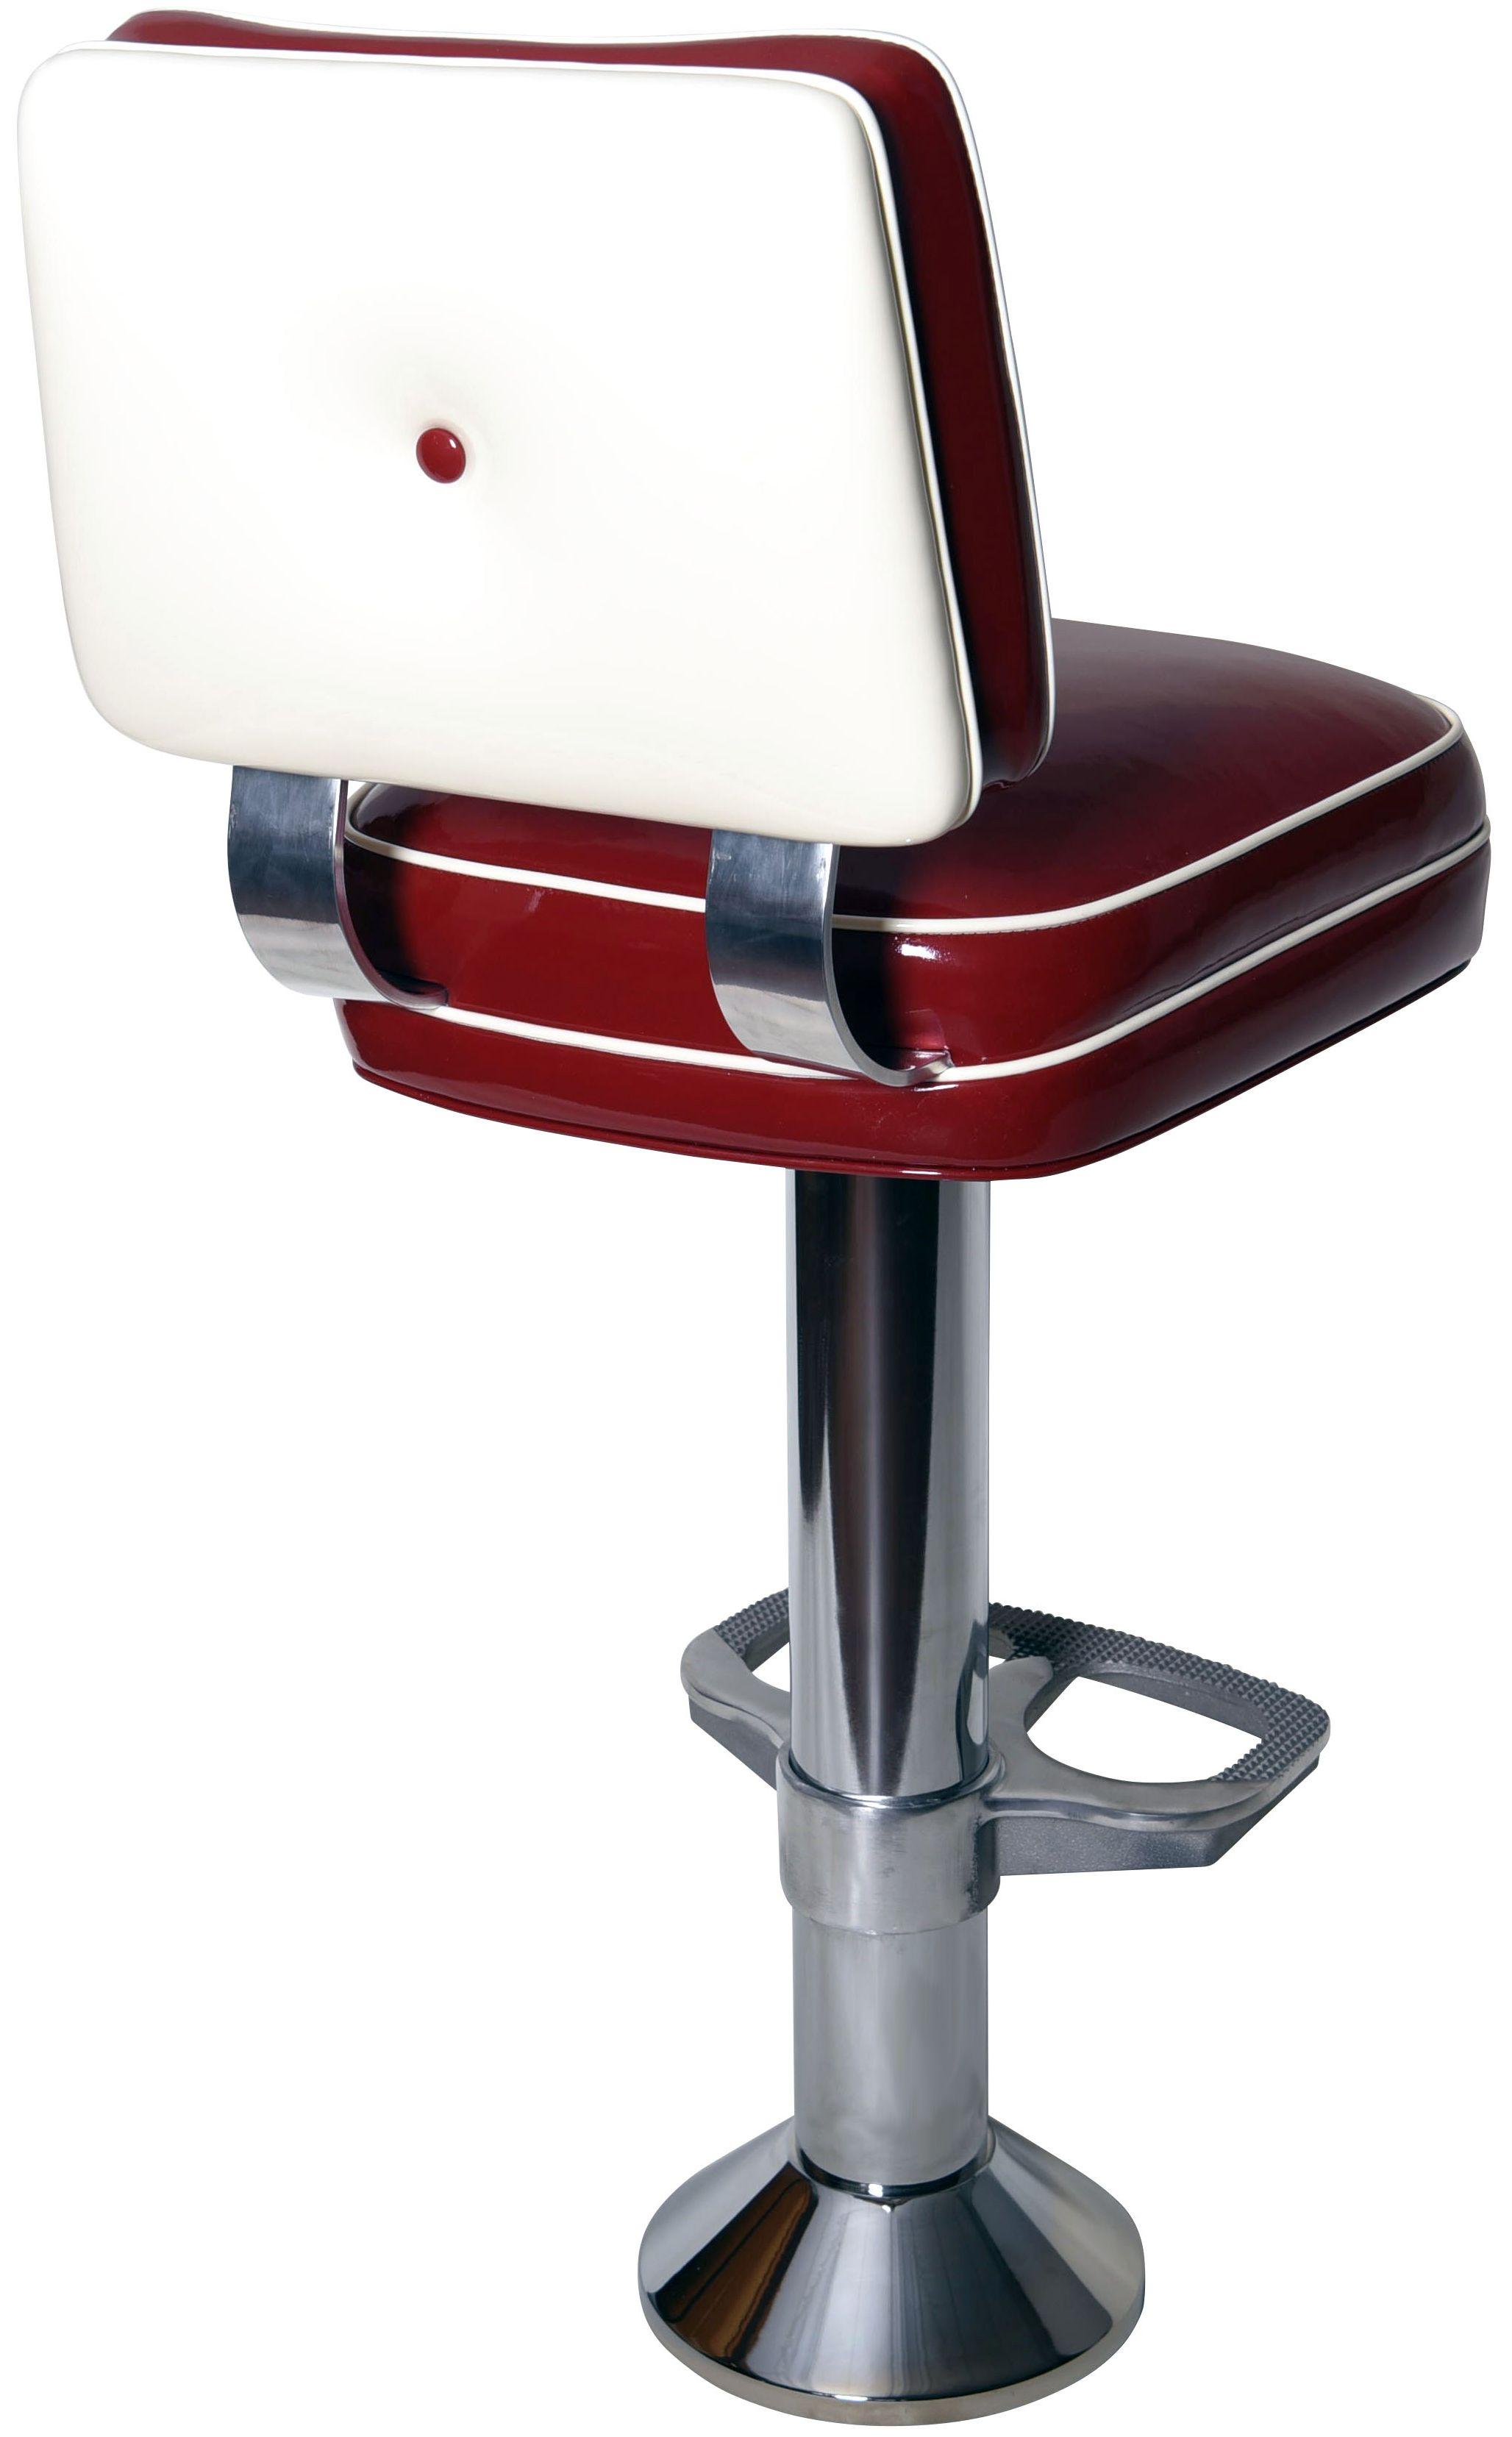 Marvelous Richardson Seating Corporation Manufactures The Worlds Creativecarmelina Interior Chair Design Creativecarmelinacom